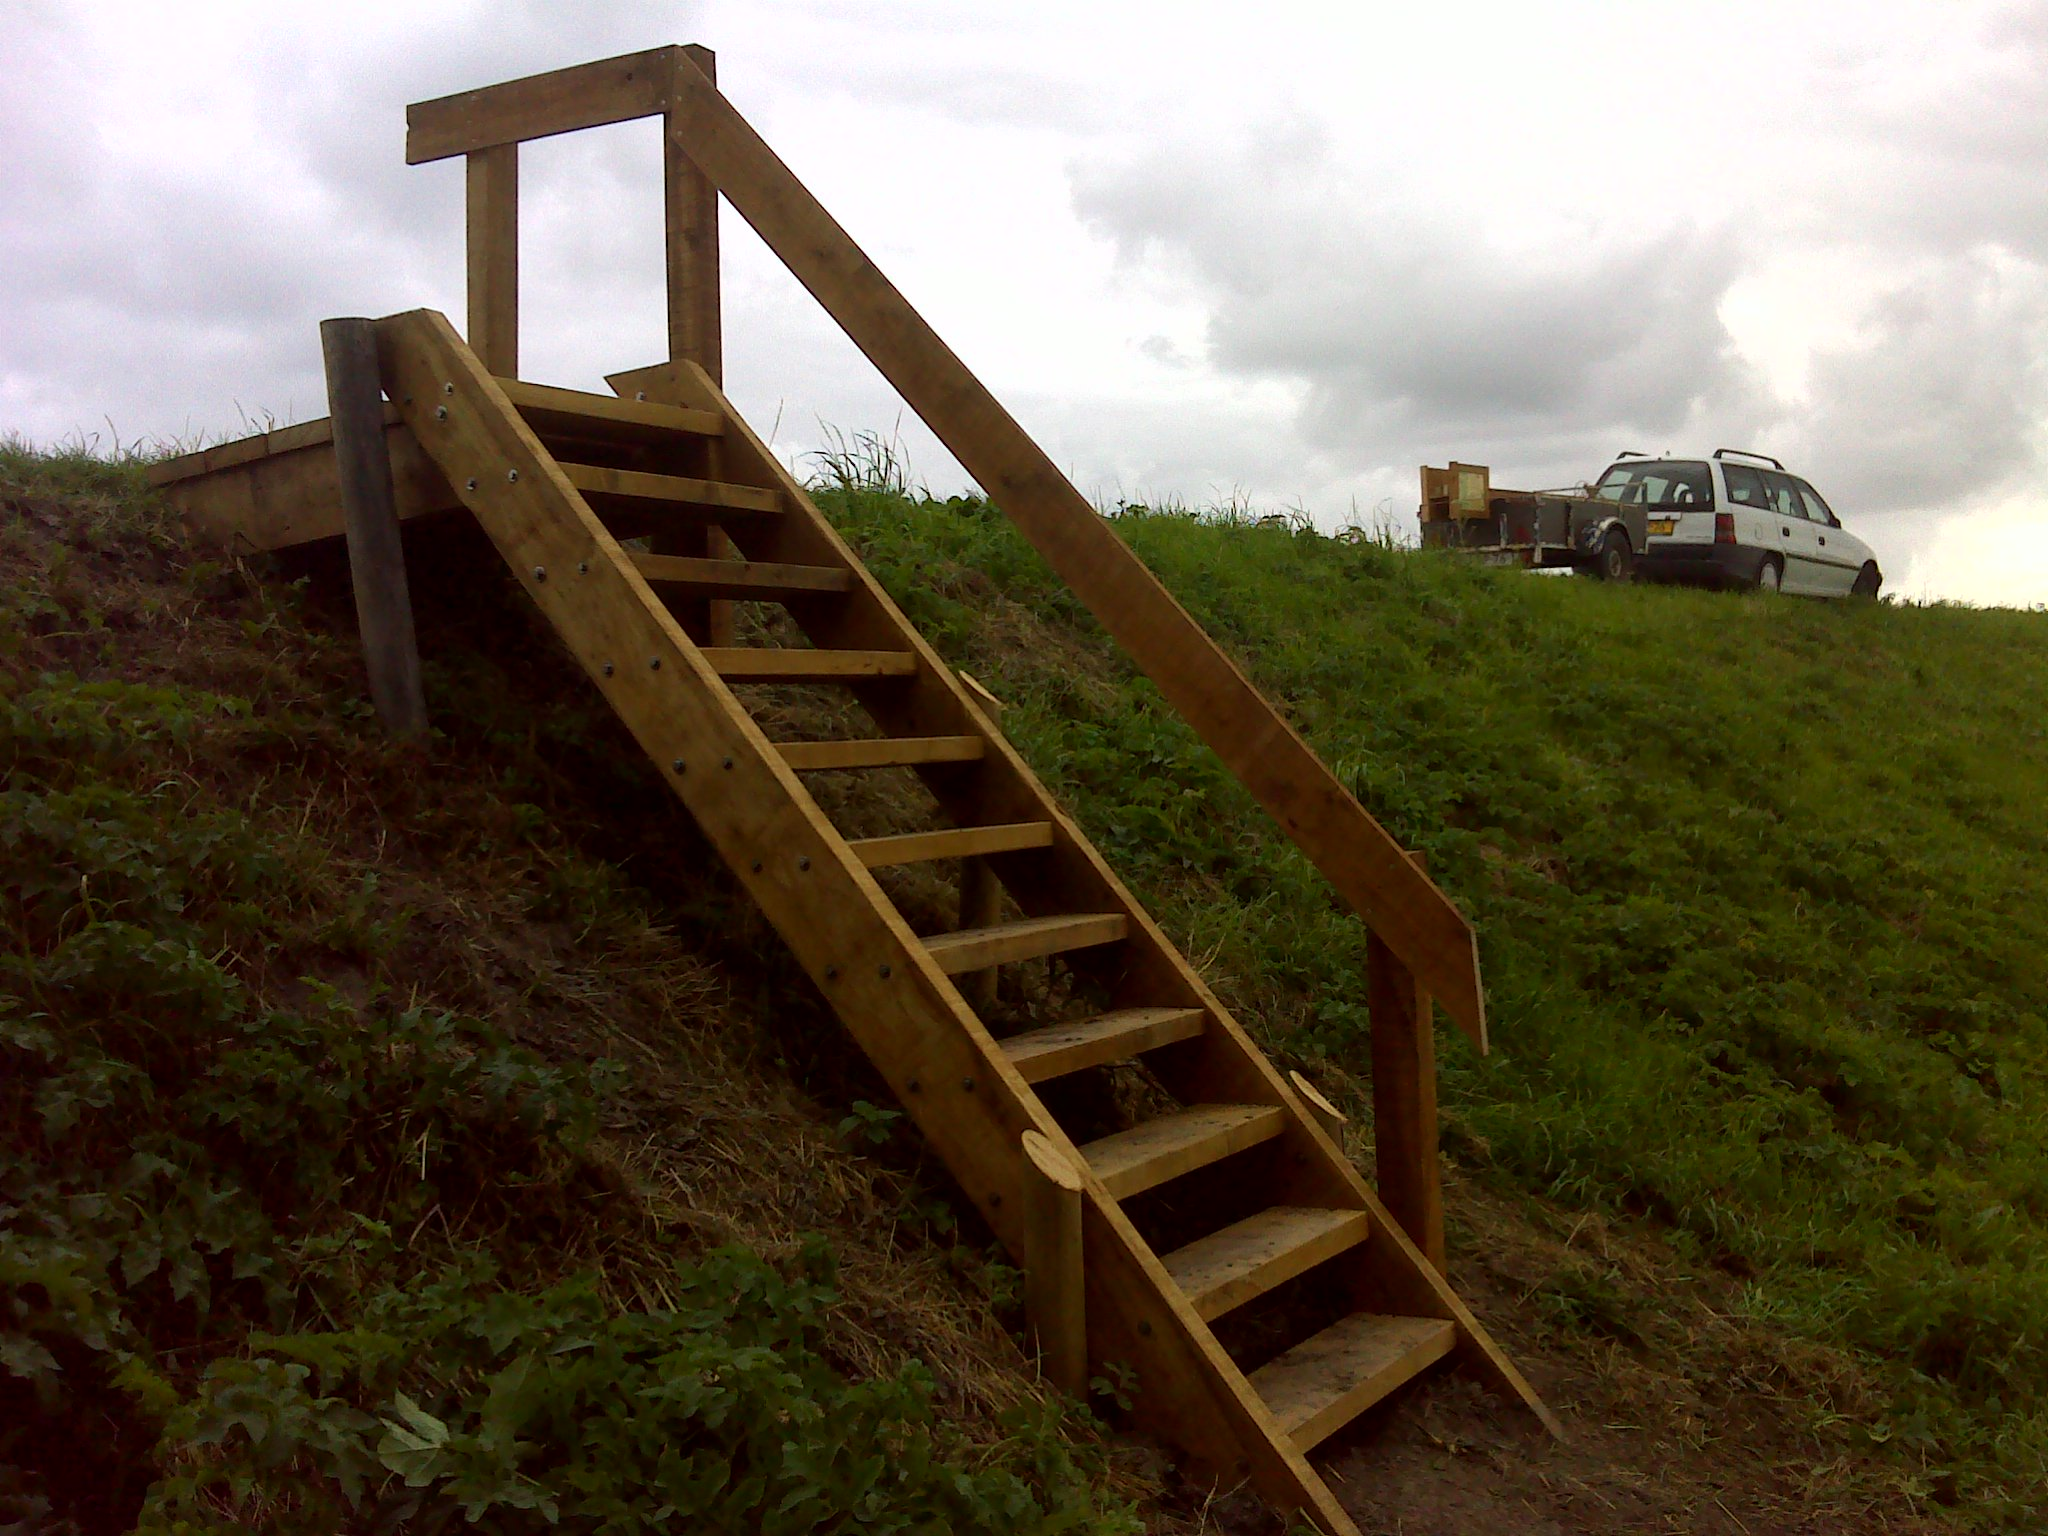 Trappen en vlonders lizard point routemarkeringen - Trap in een helling ...